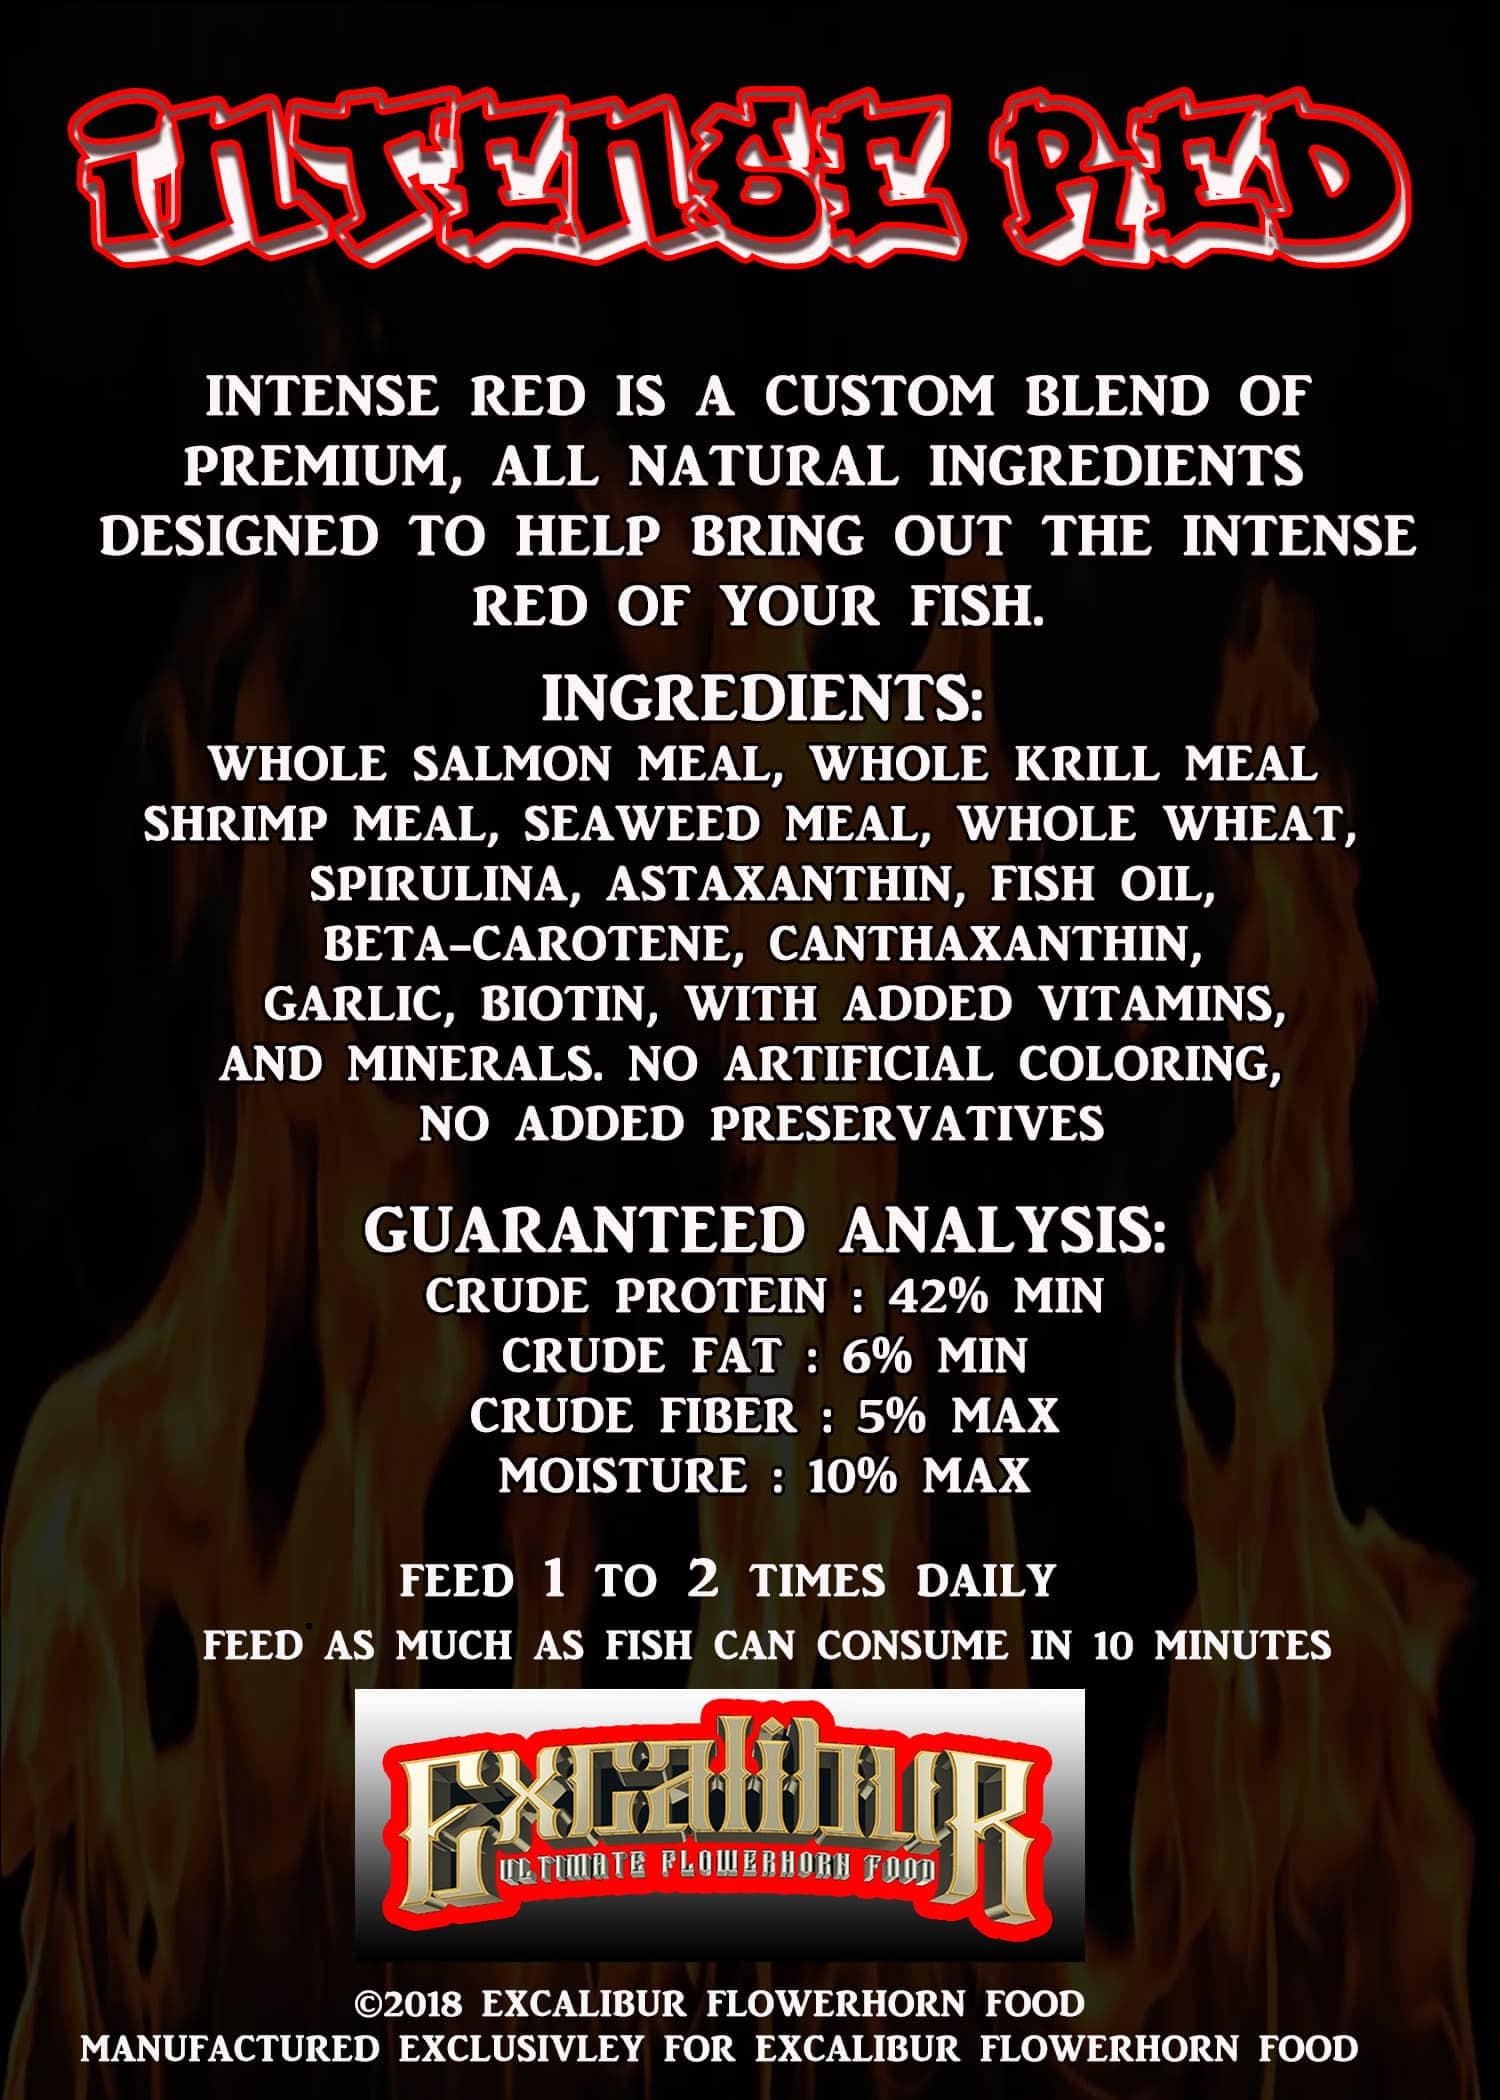 Intense Red Flowerhorn Food